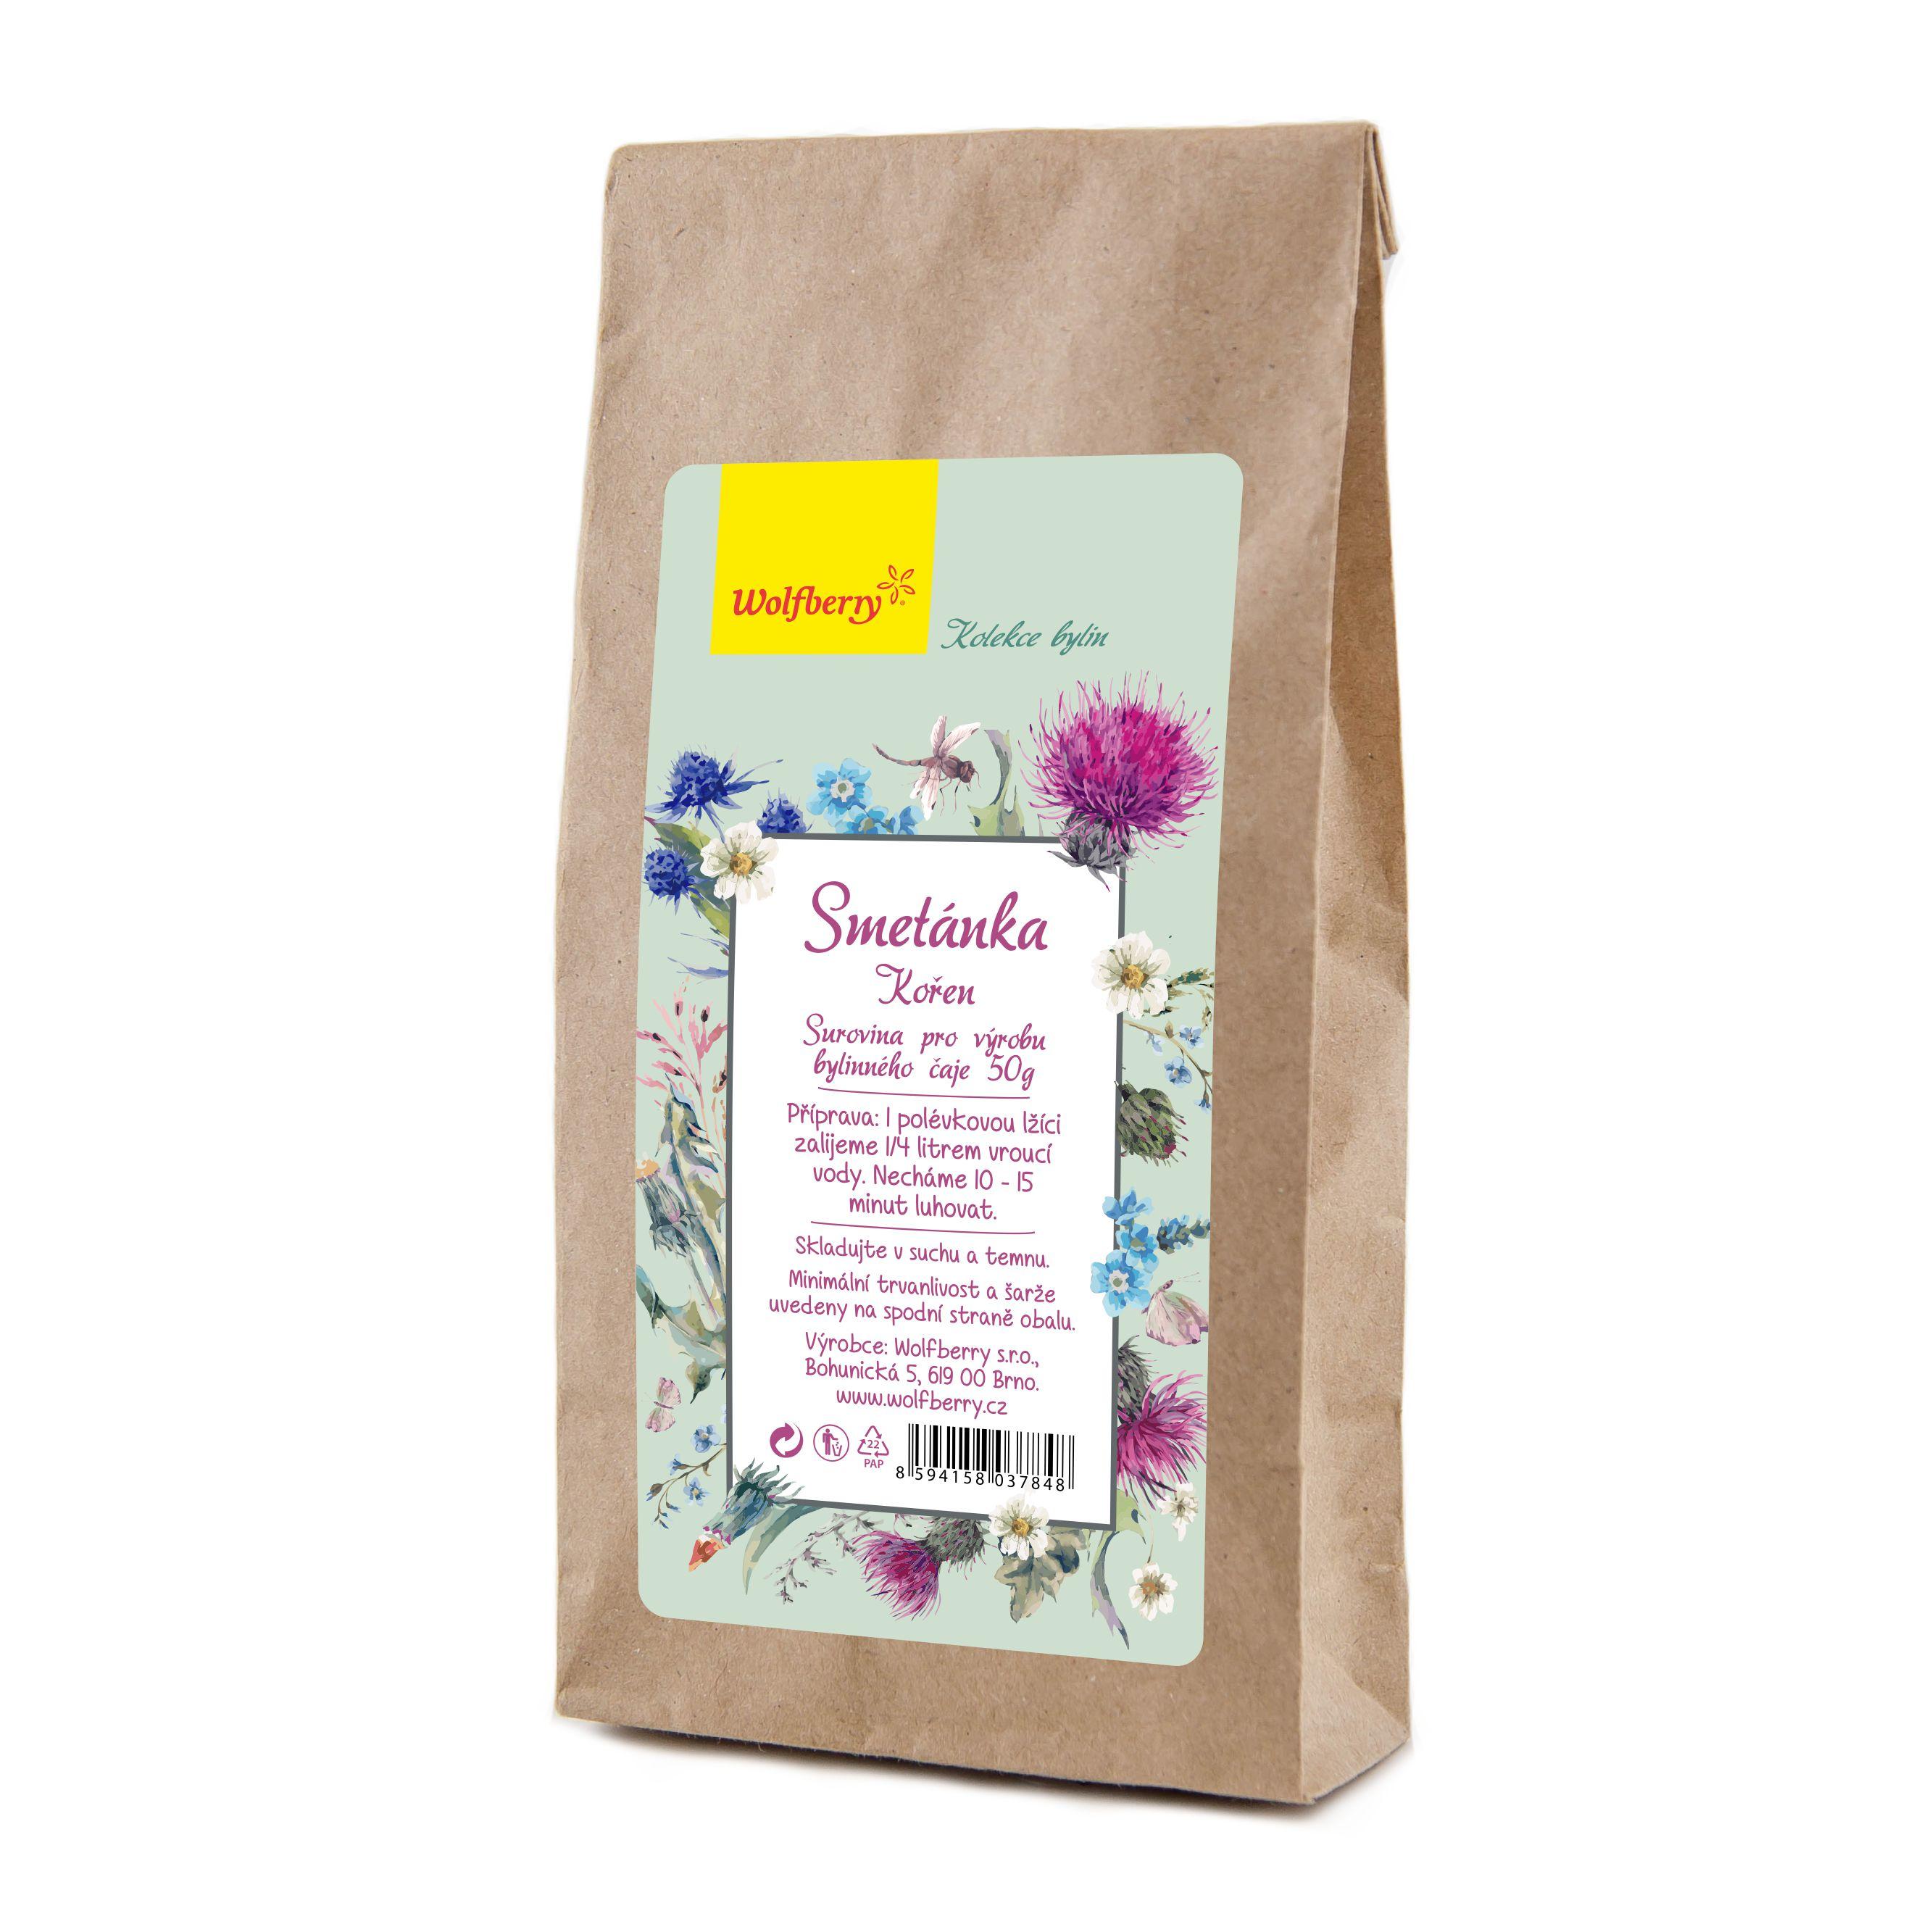 Smetánka bylinný čaj 50 g Wolfberry